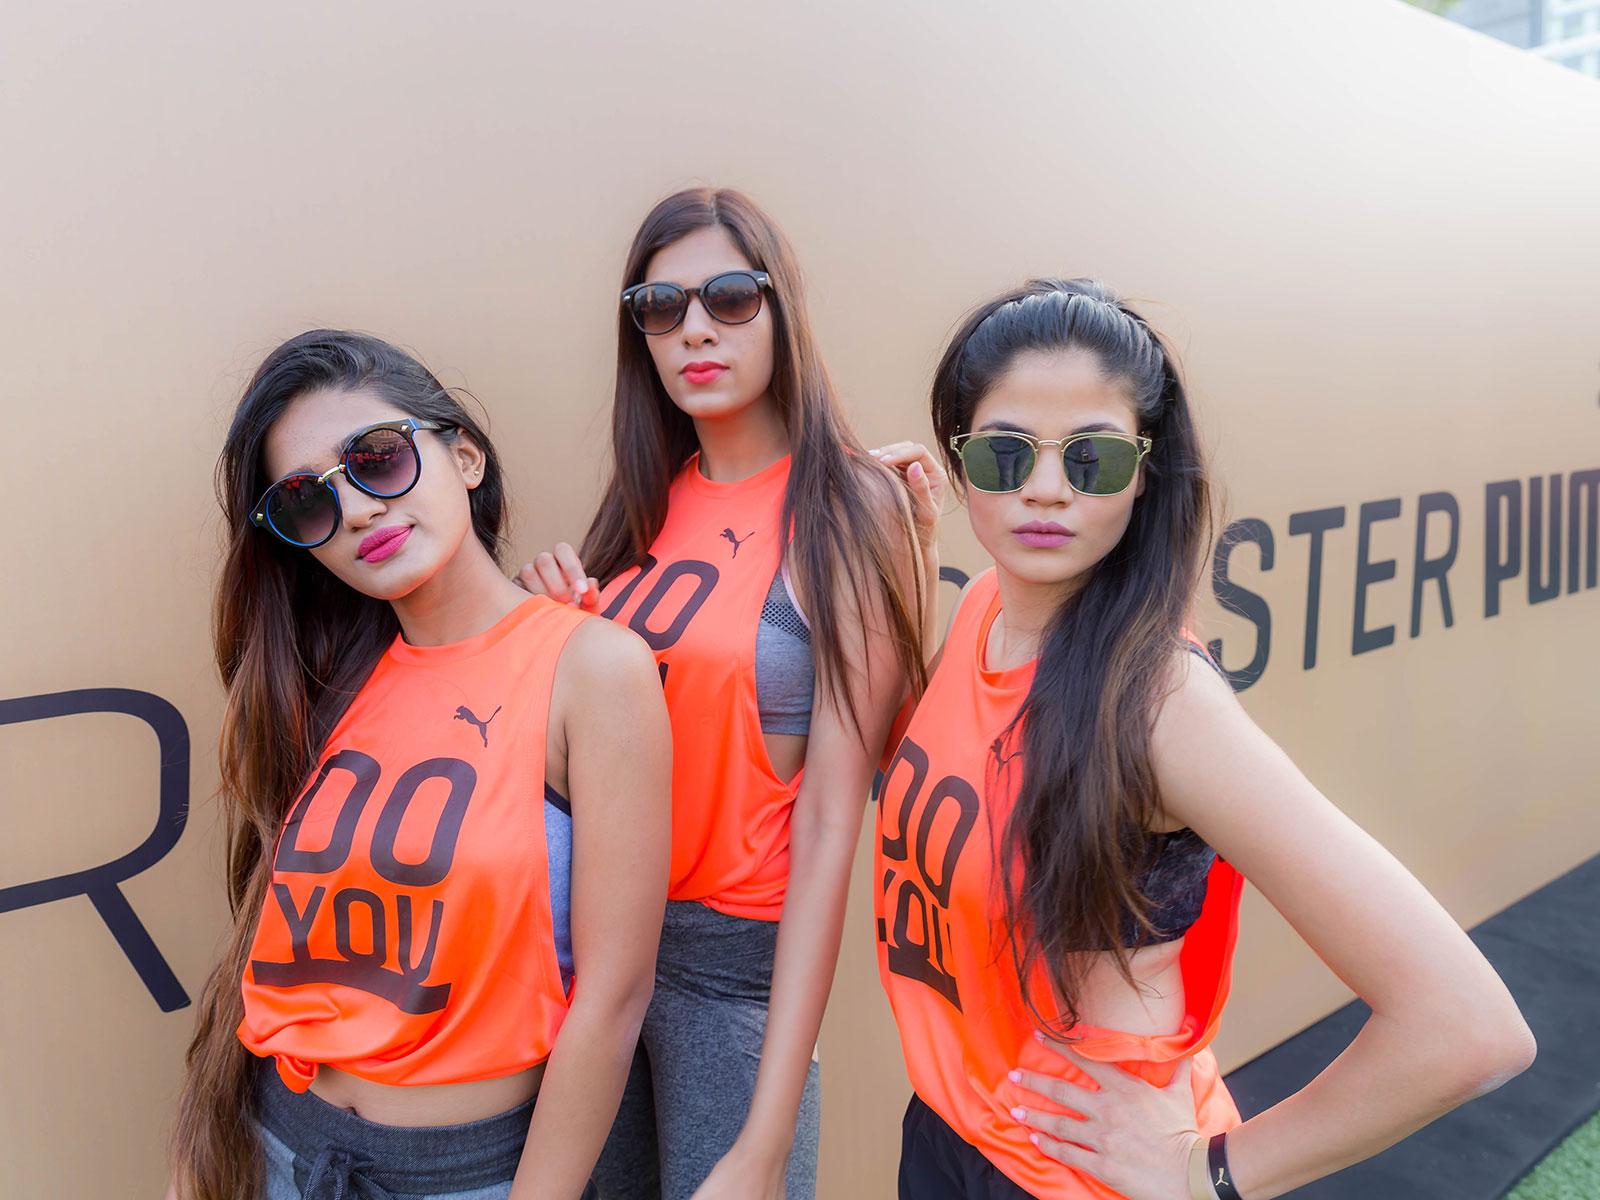 Shabnam Fathima, Rashi Mehra and Sejal at the PUMA Do You event held at Jio Garden in Mumbai